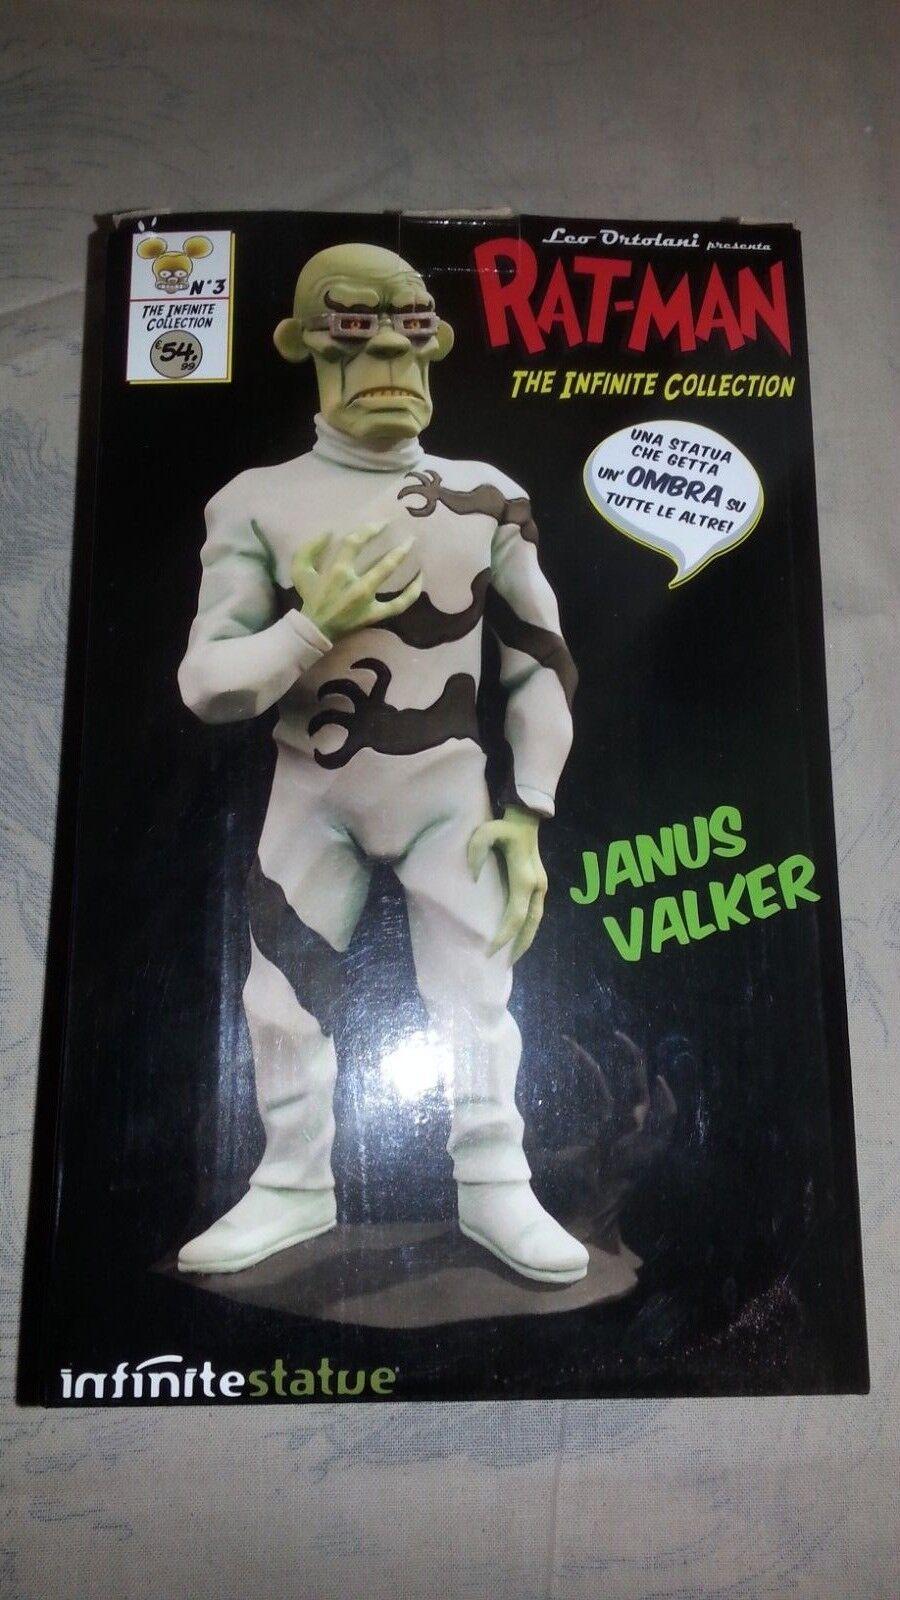 RATMAN THE INFINITE COLLECTION JANUS VALKER - - - infinite statue 469 499-AF1 7615a8